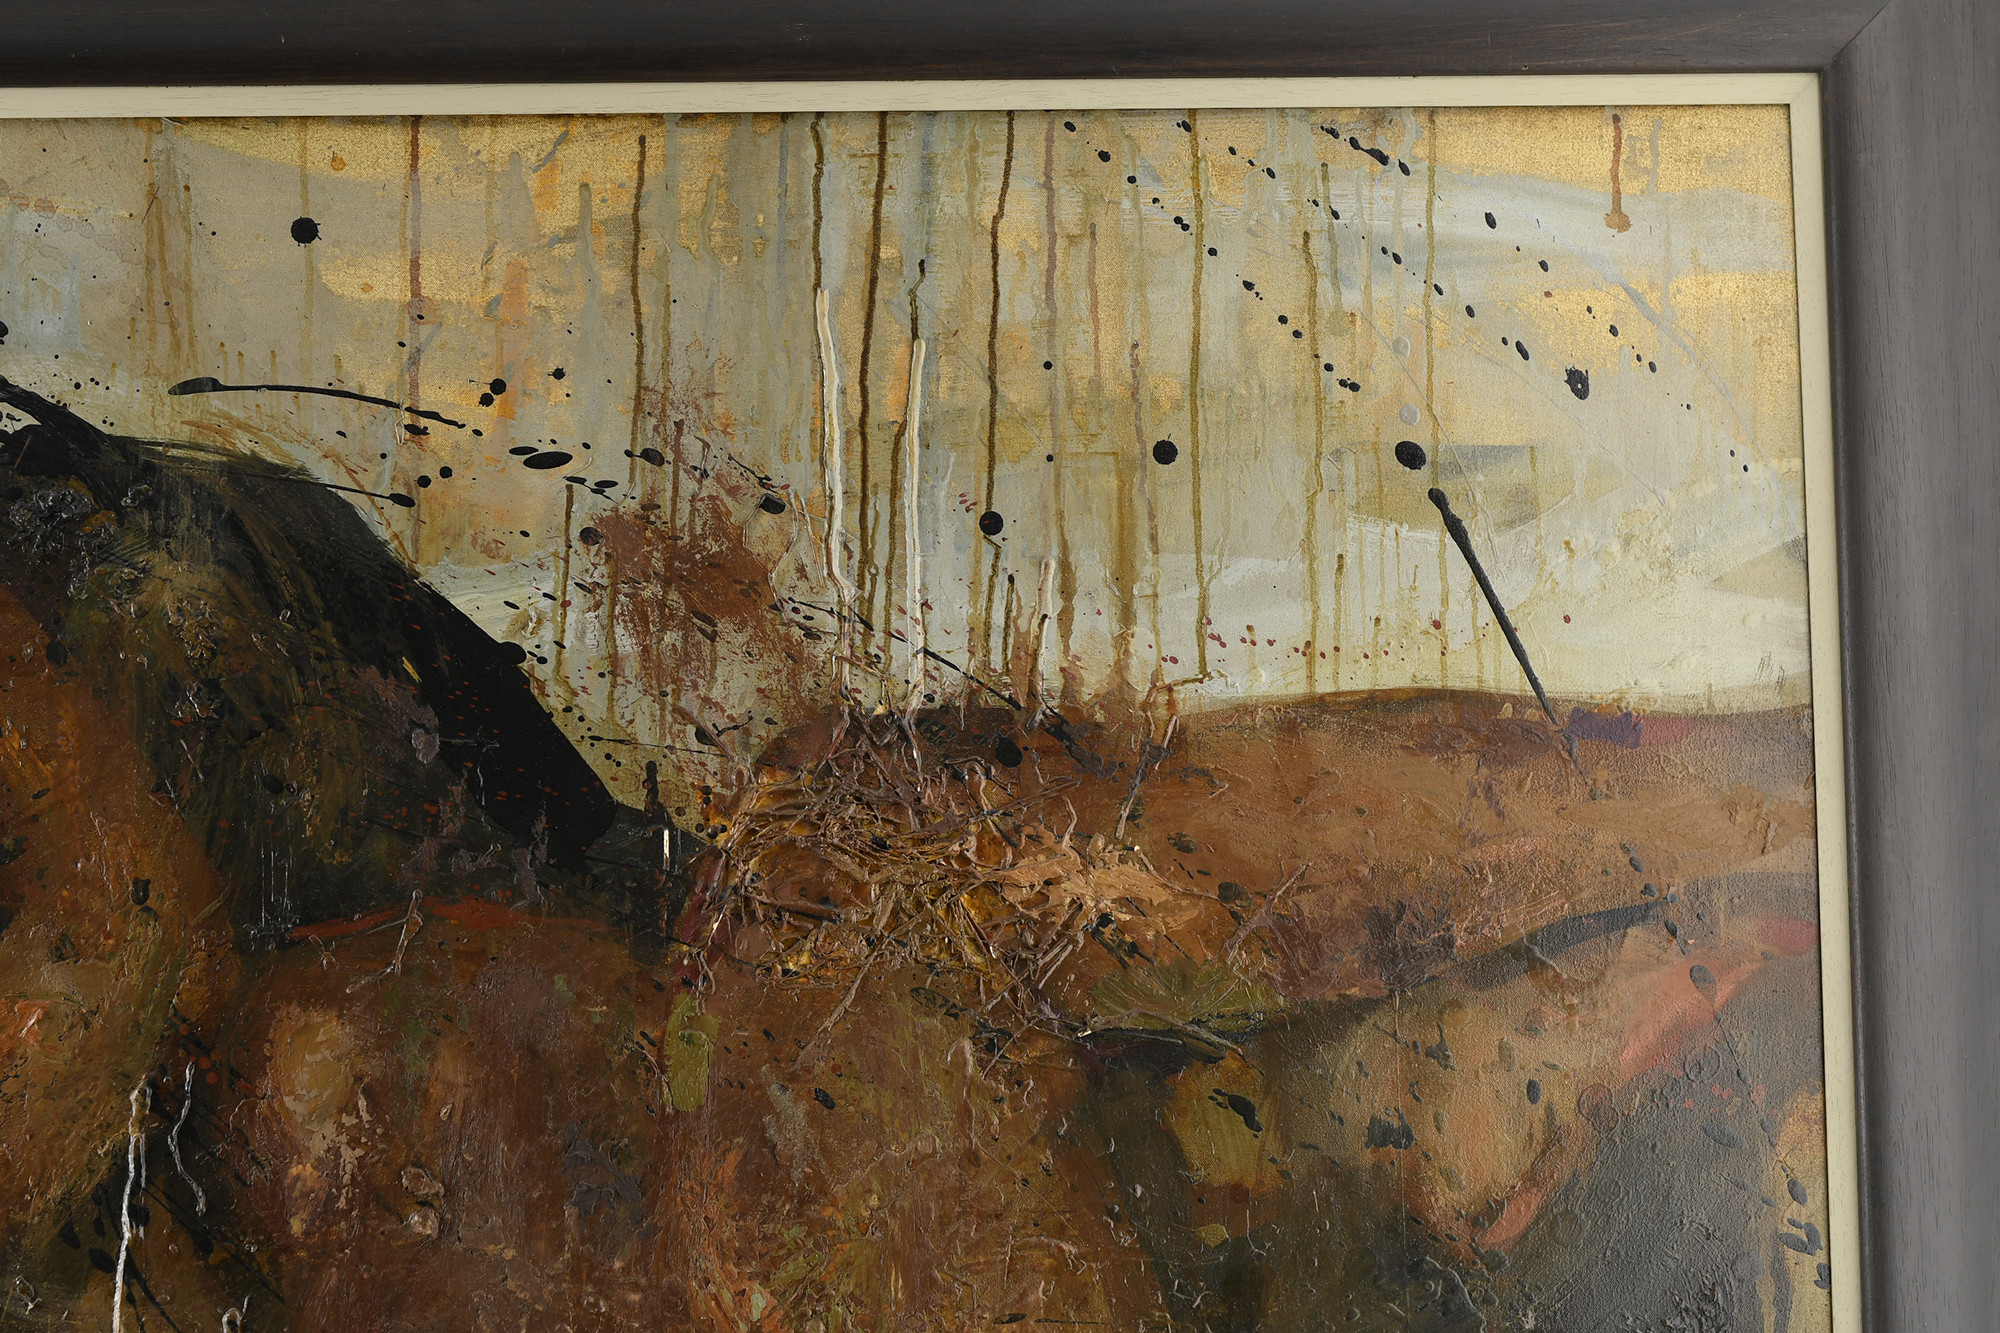 Stunning Original Painting by Renowned Scottish artist Alan McGowan. - Image 18 of 22